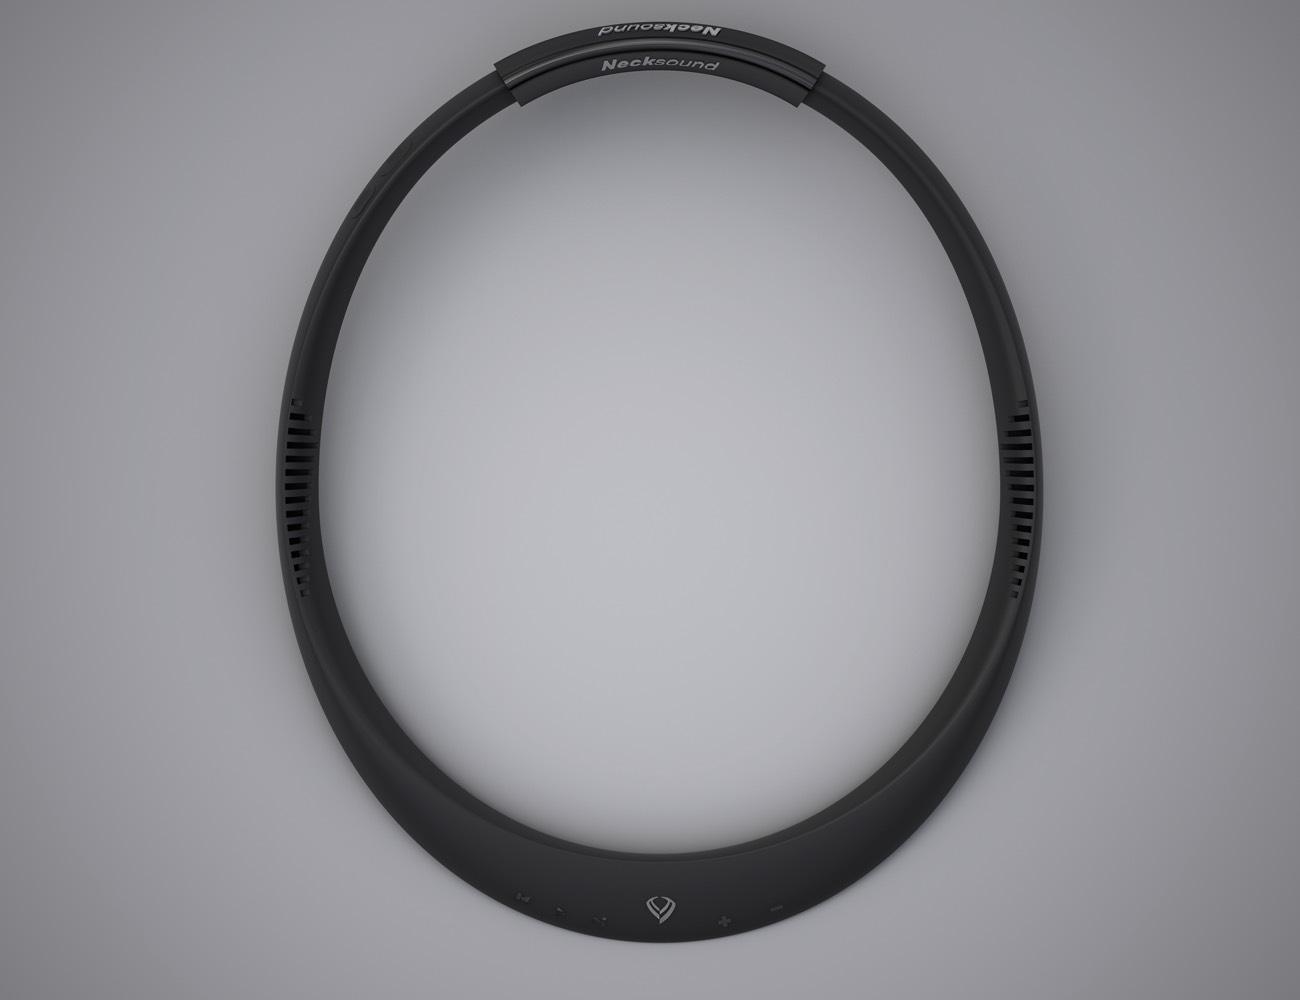 Necksound – Smart Wireless Necklace Wearable Music Device